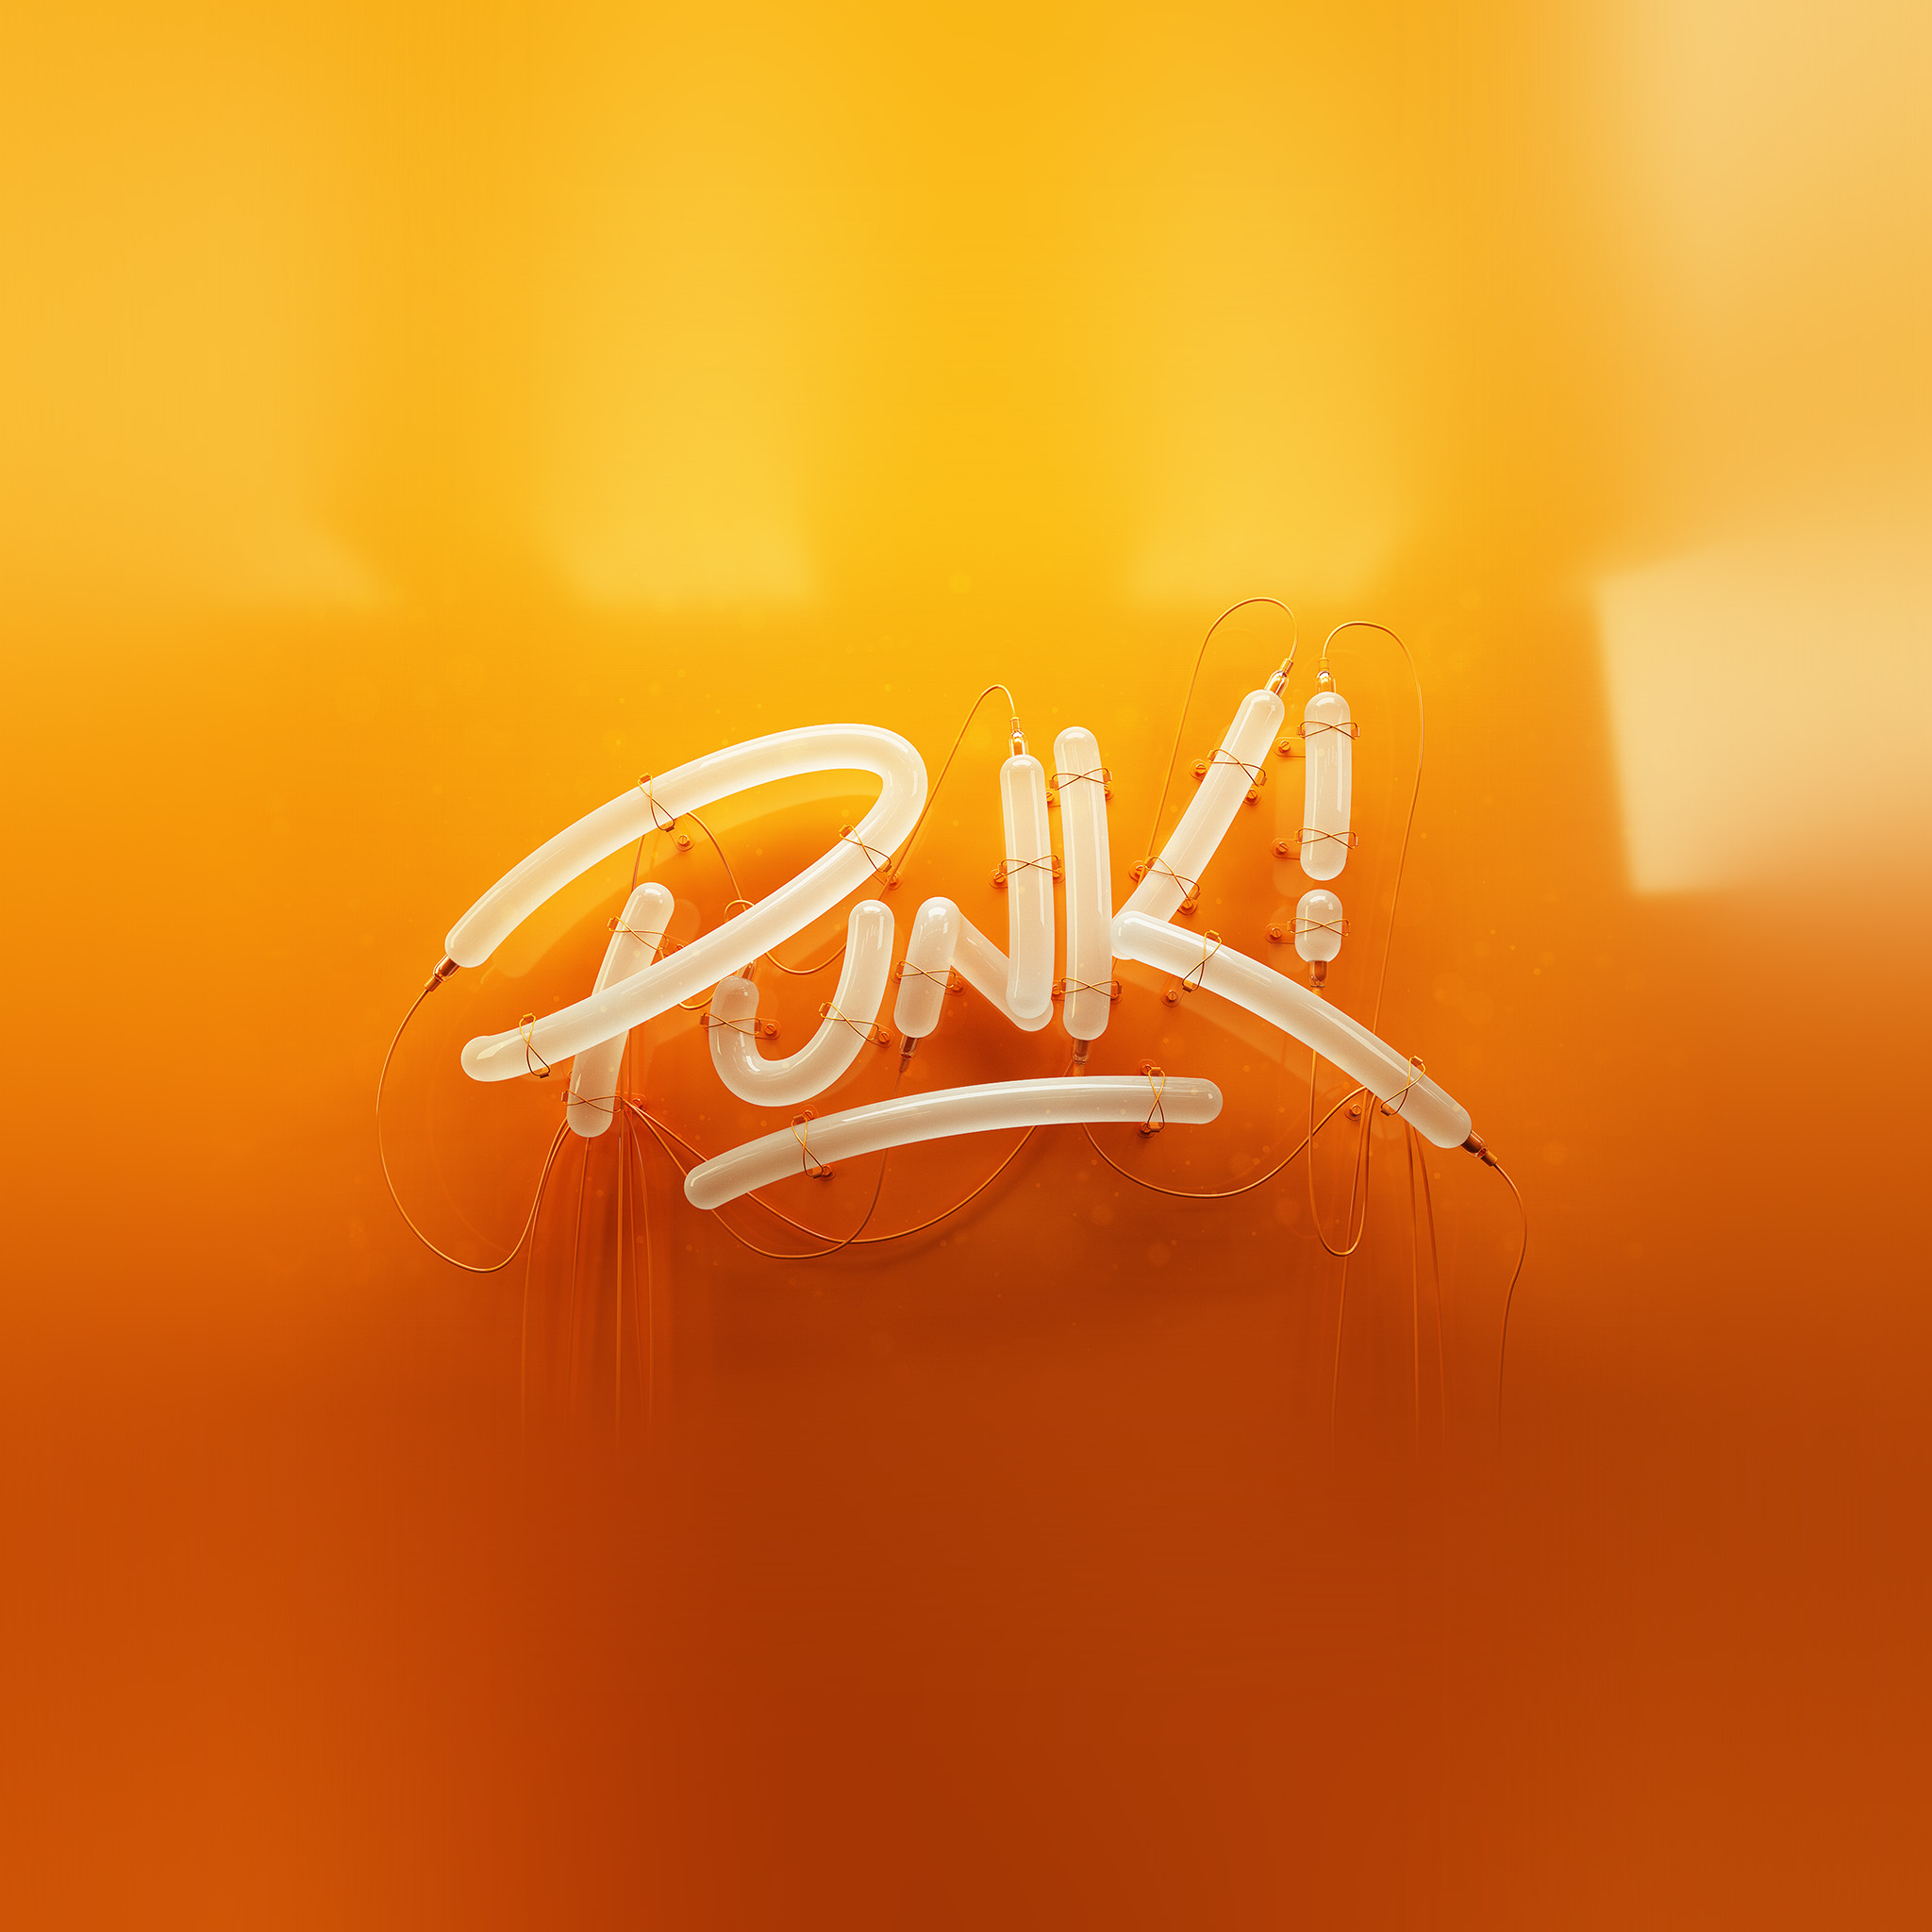 Ay76 punk neon sign art minimal illustration art orange for Minimal art neon